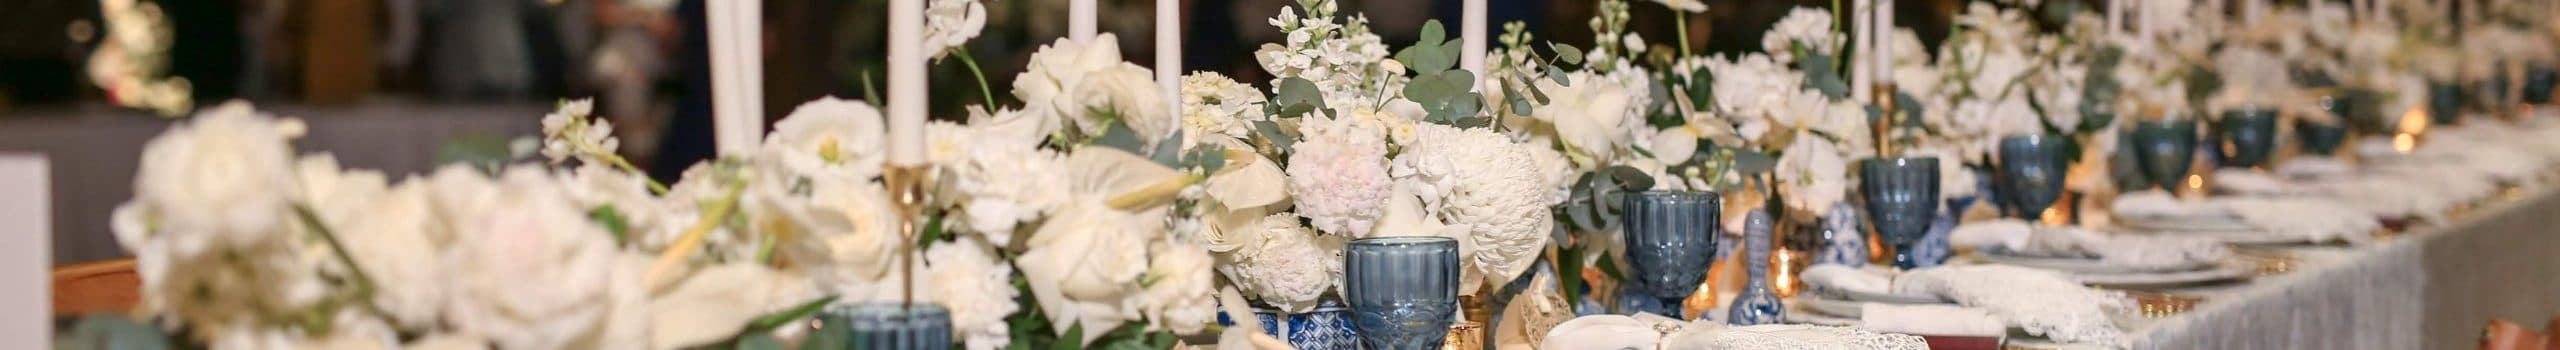 sr-wedding-event-house-set-up